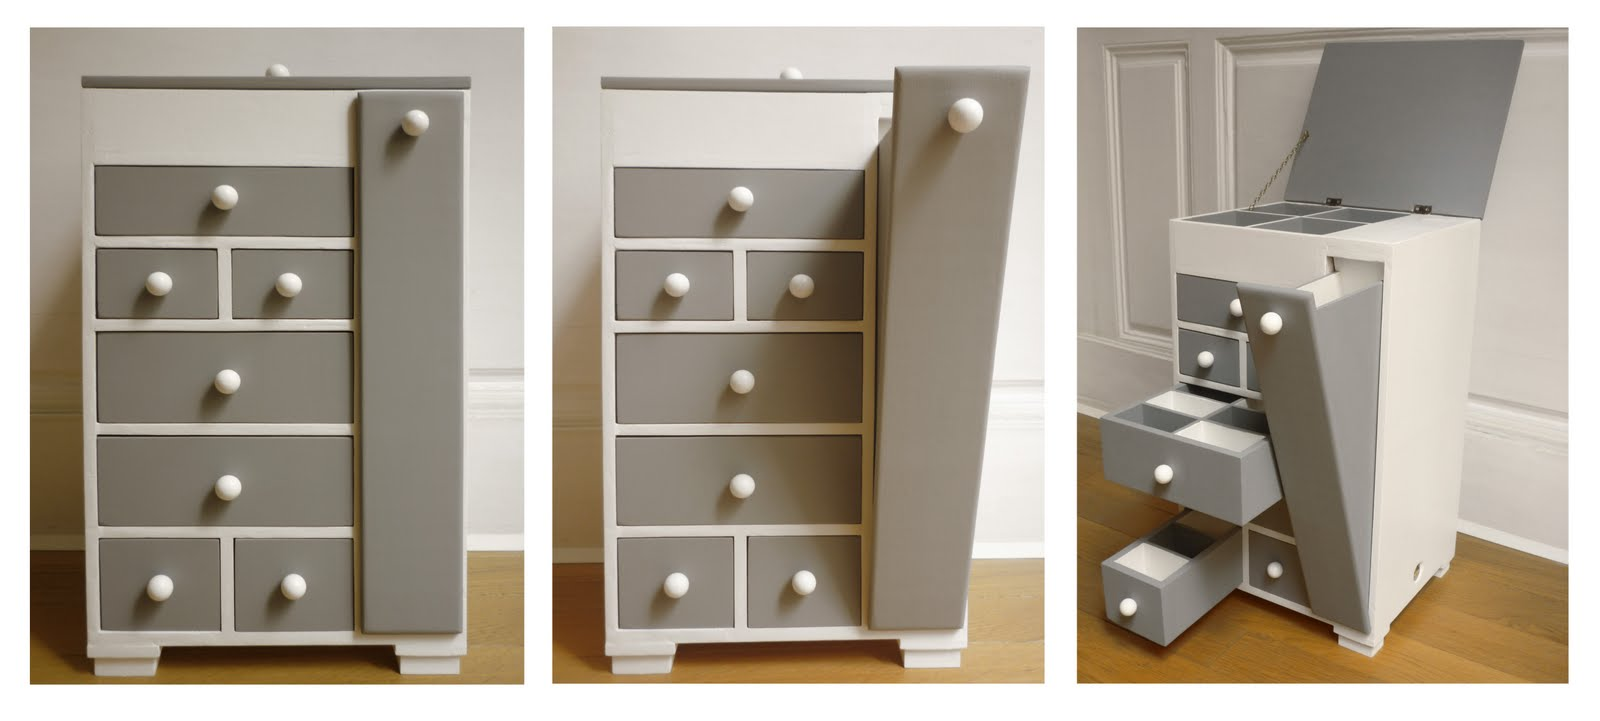 mini meuble mini meuble couture version 2 0. Black Bedroom Furniture Sets. Home Design Ideas